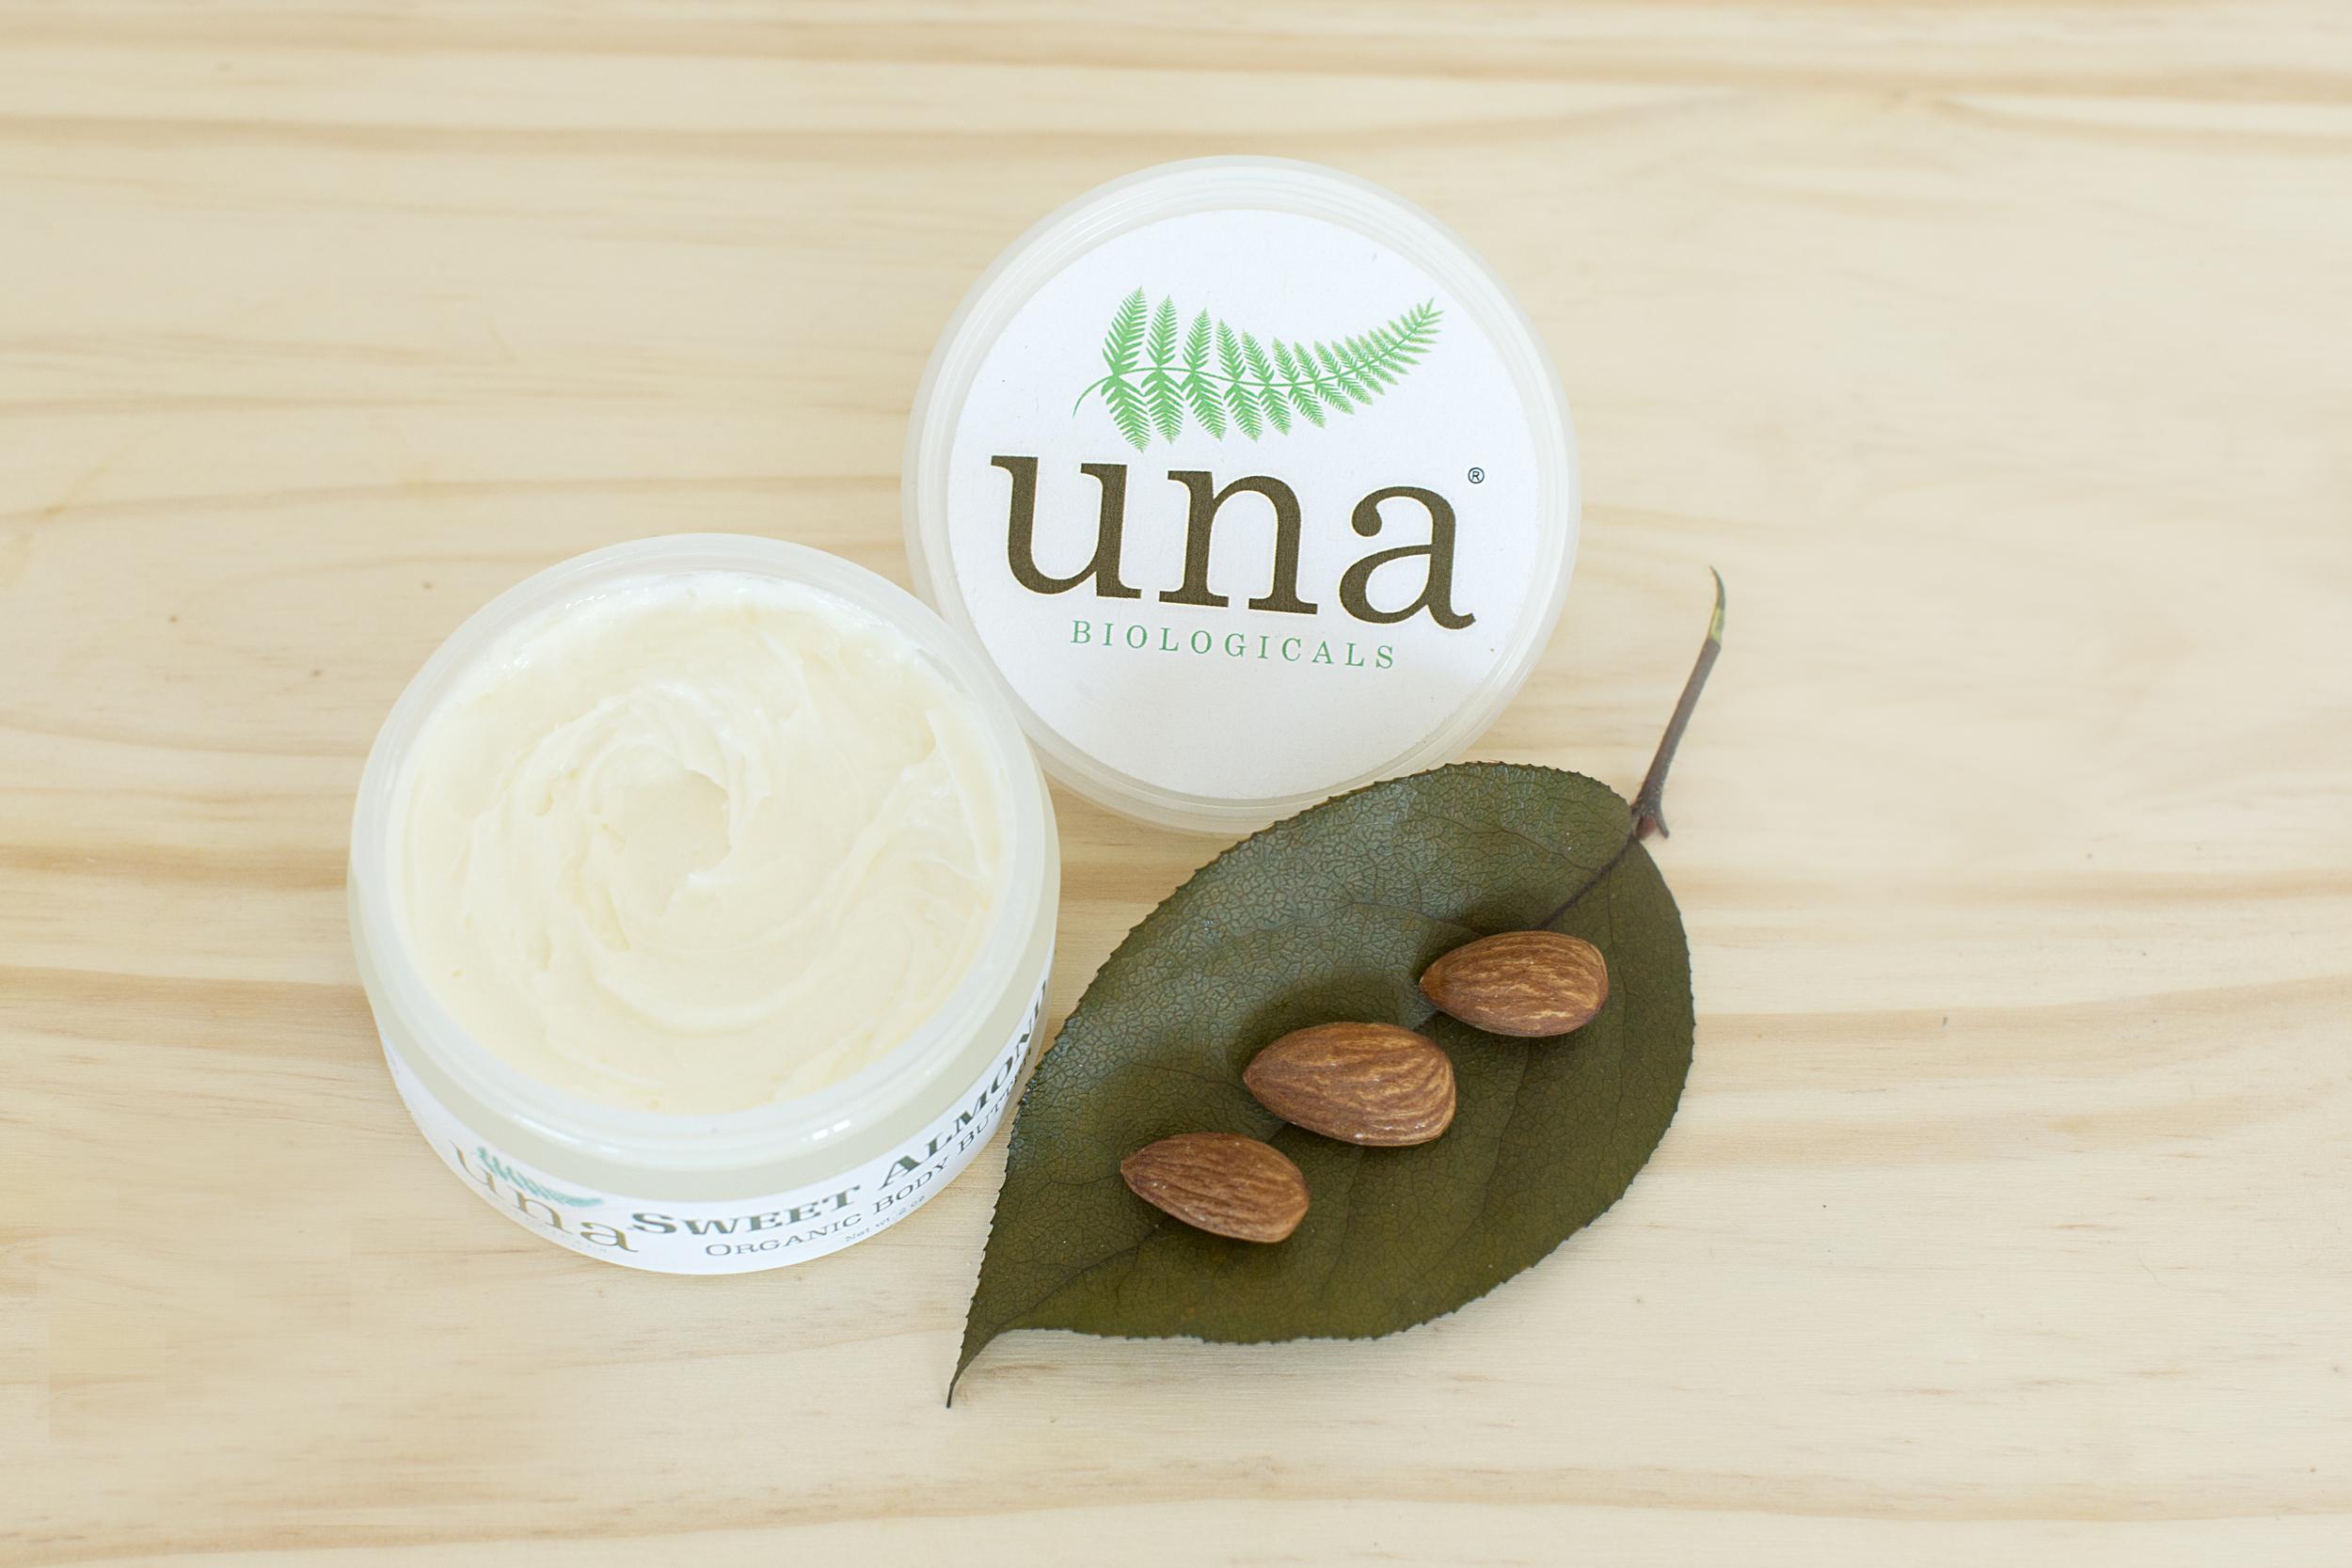 Una Biologicals Sweet Almond Organic Body Butter